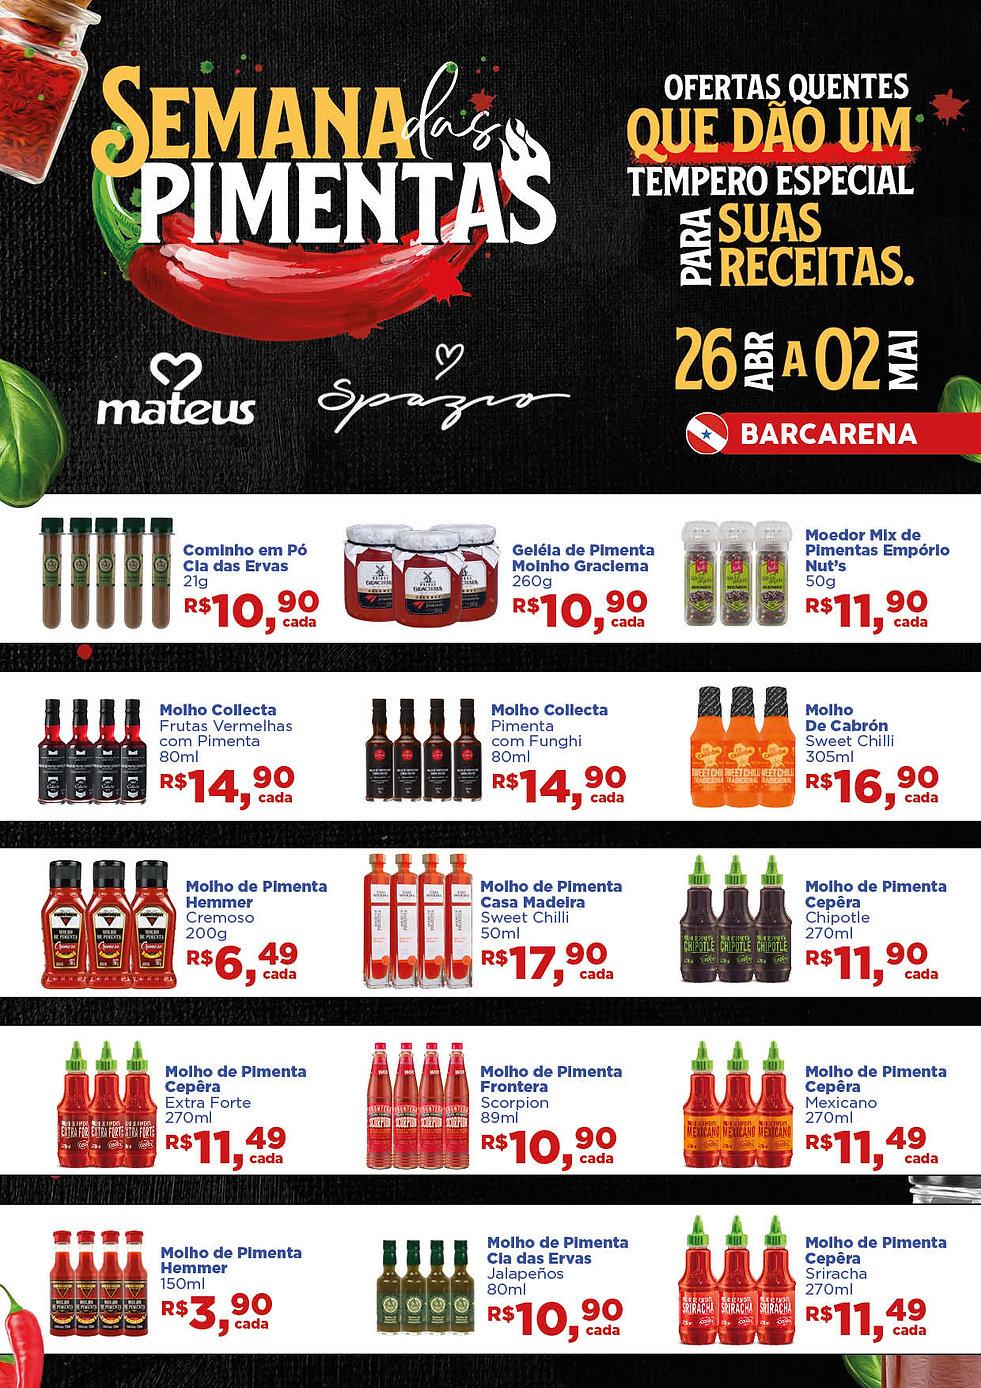 SEMANA_DAS_PIMENTAS_MATEUS_SPAZIO_DE_26_